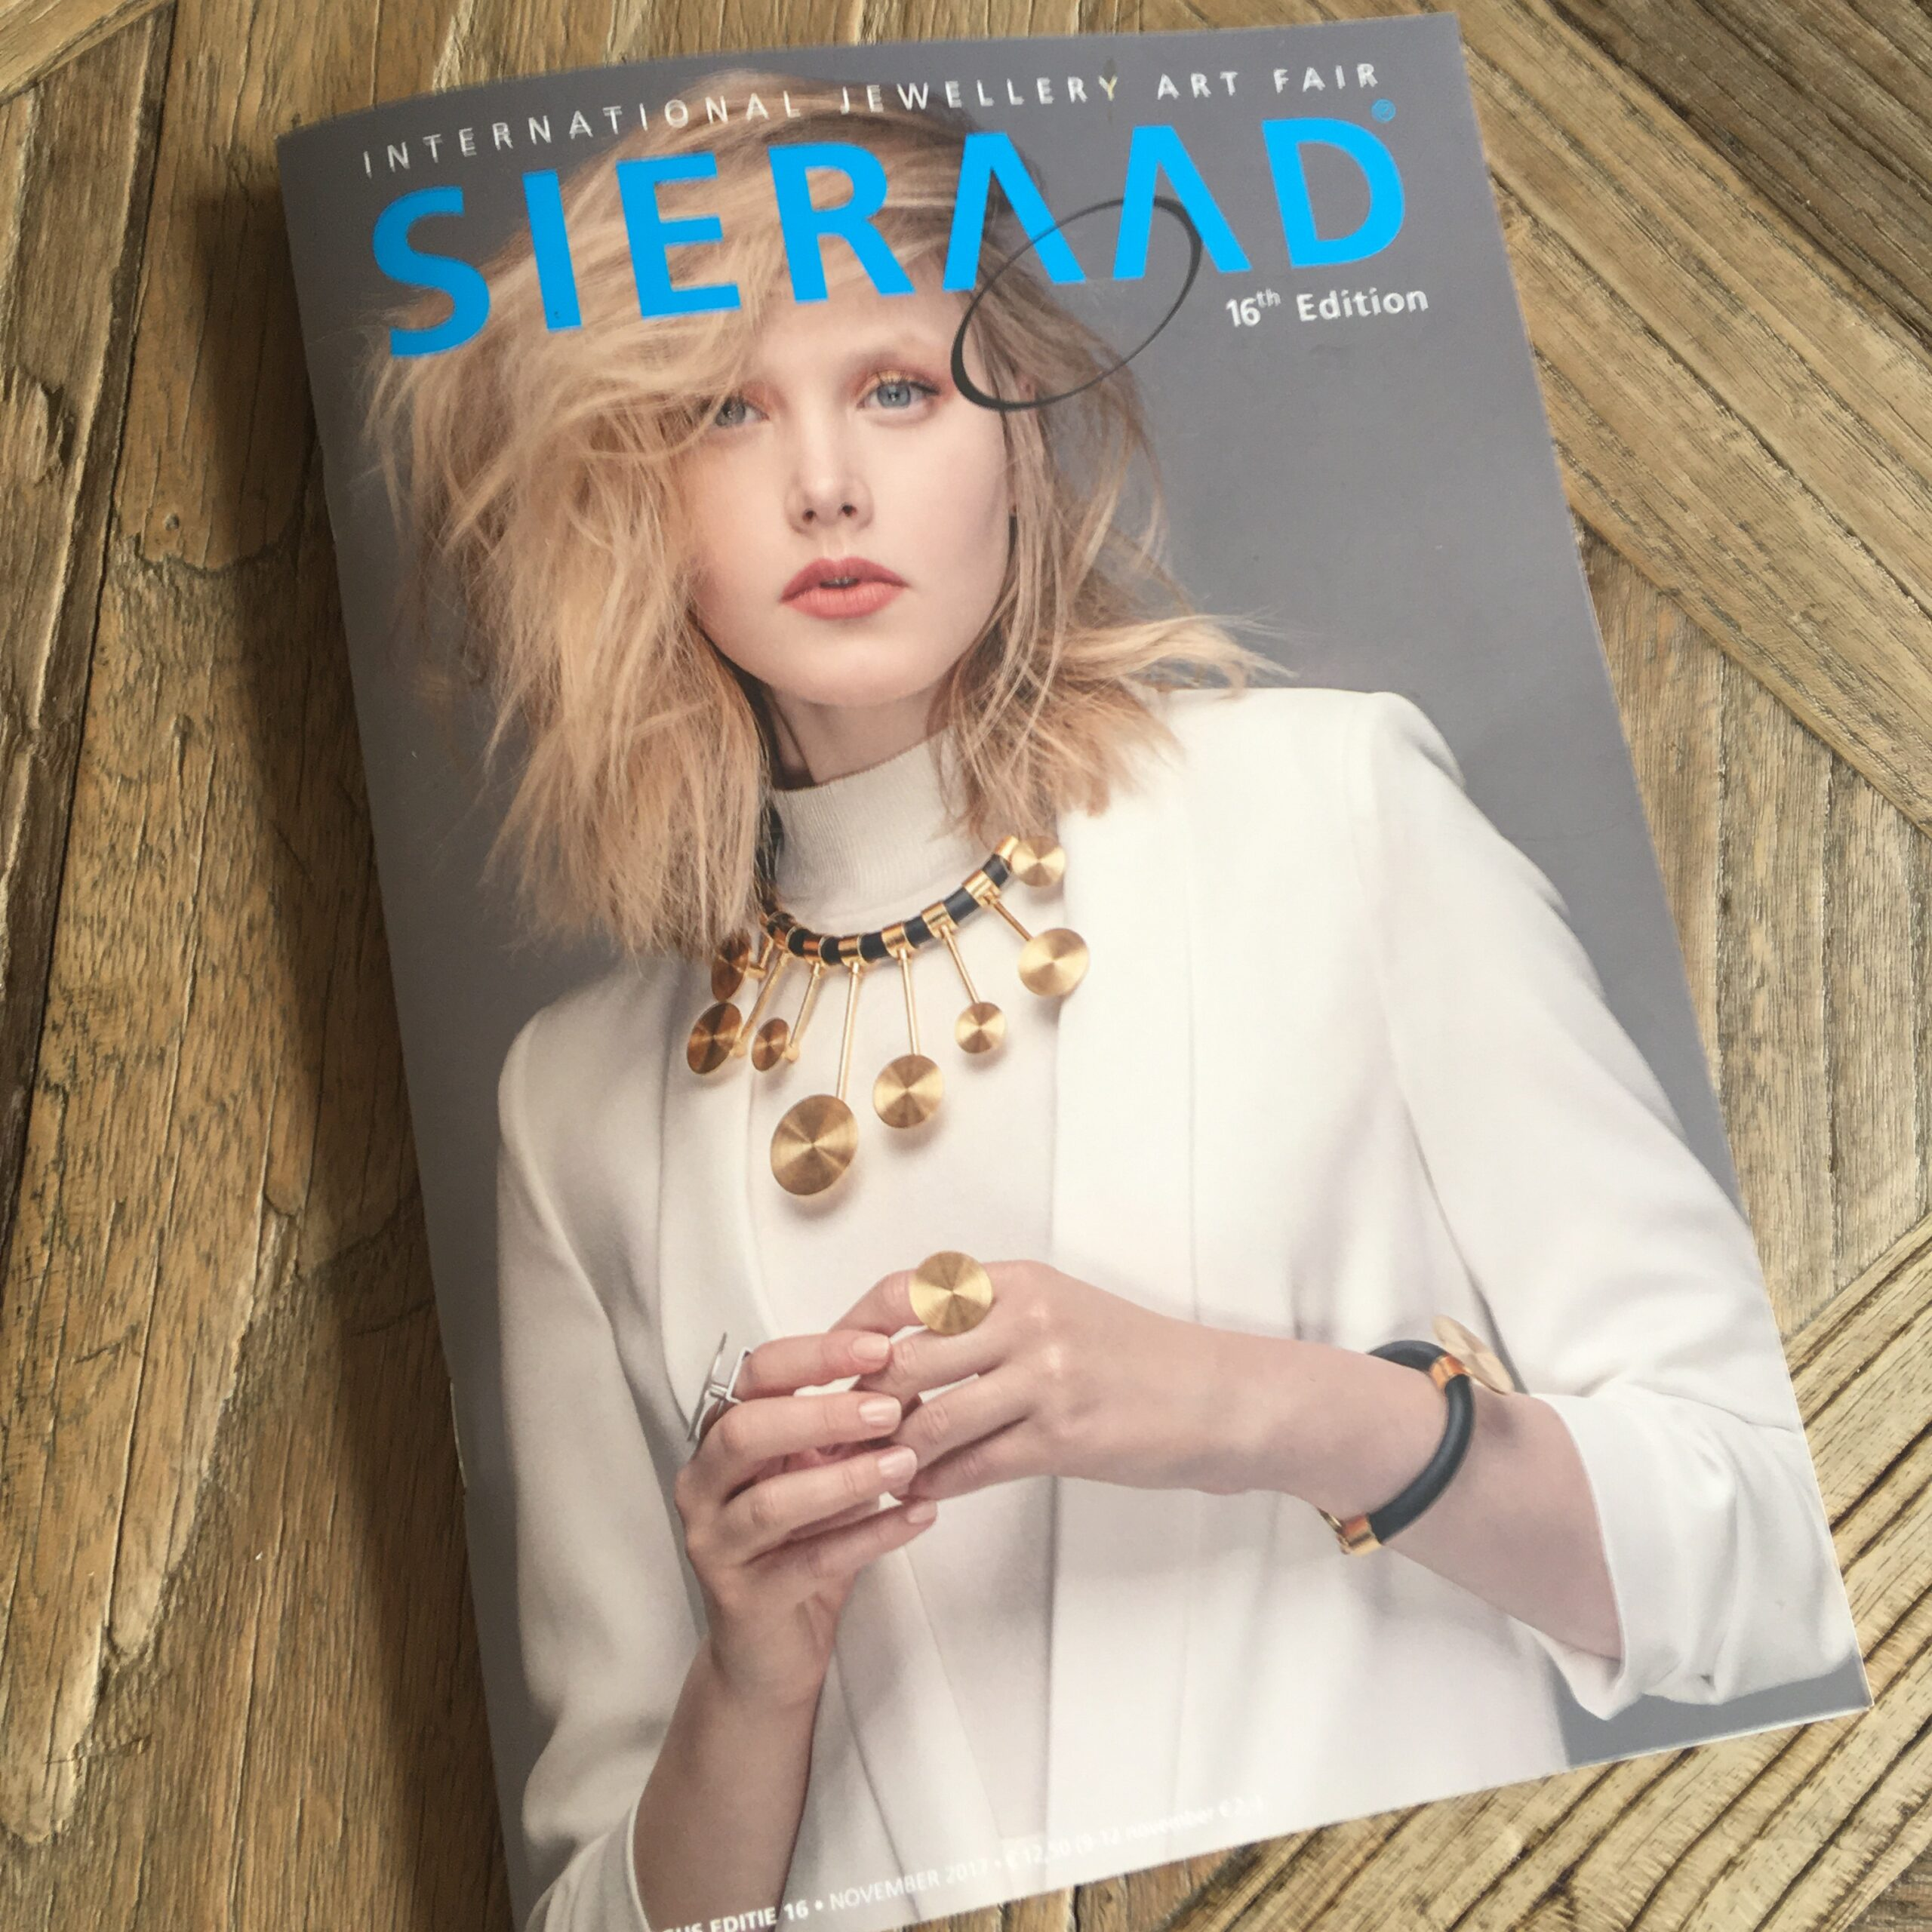 Sieraad Art Fair 2017